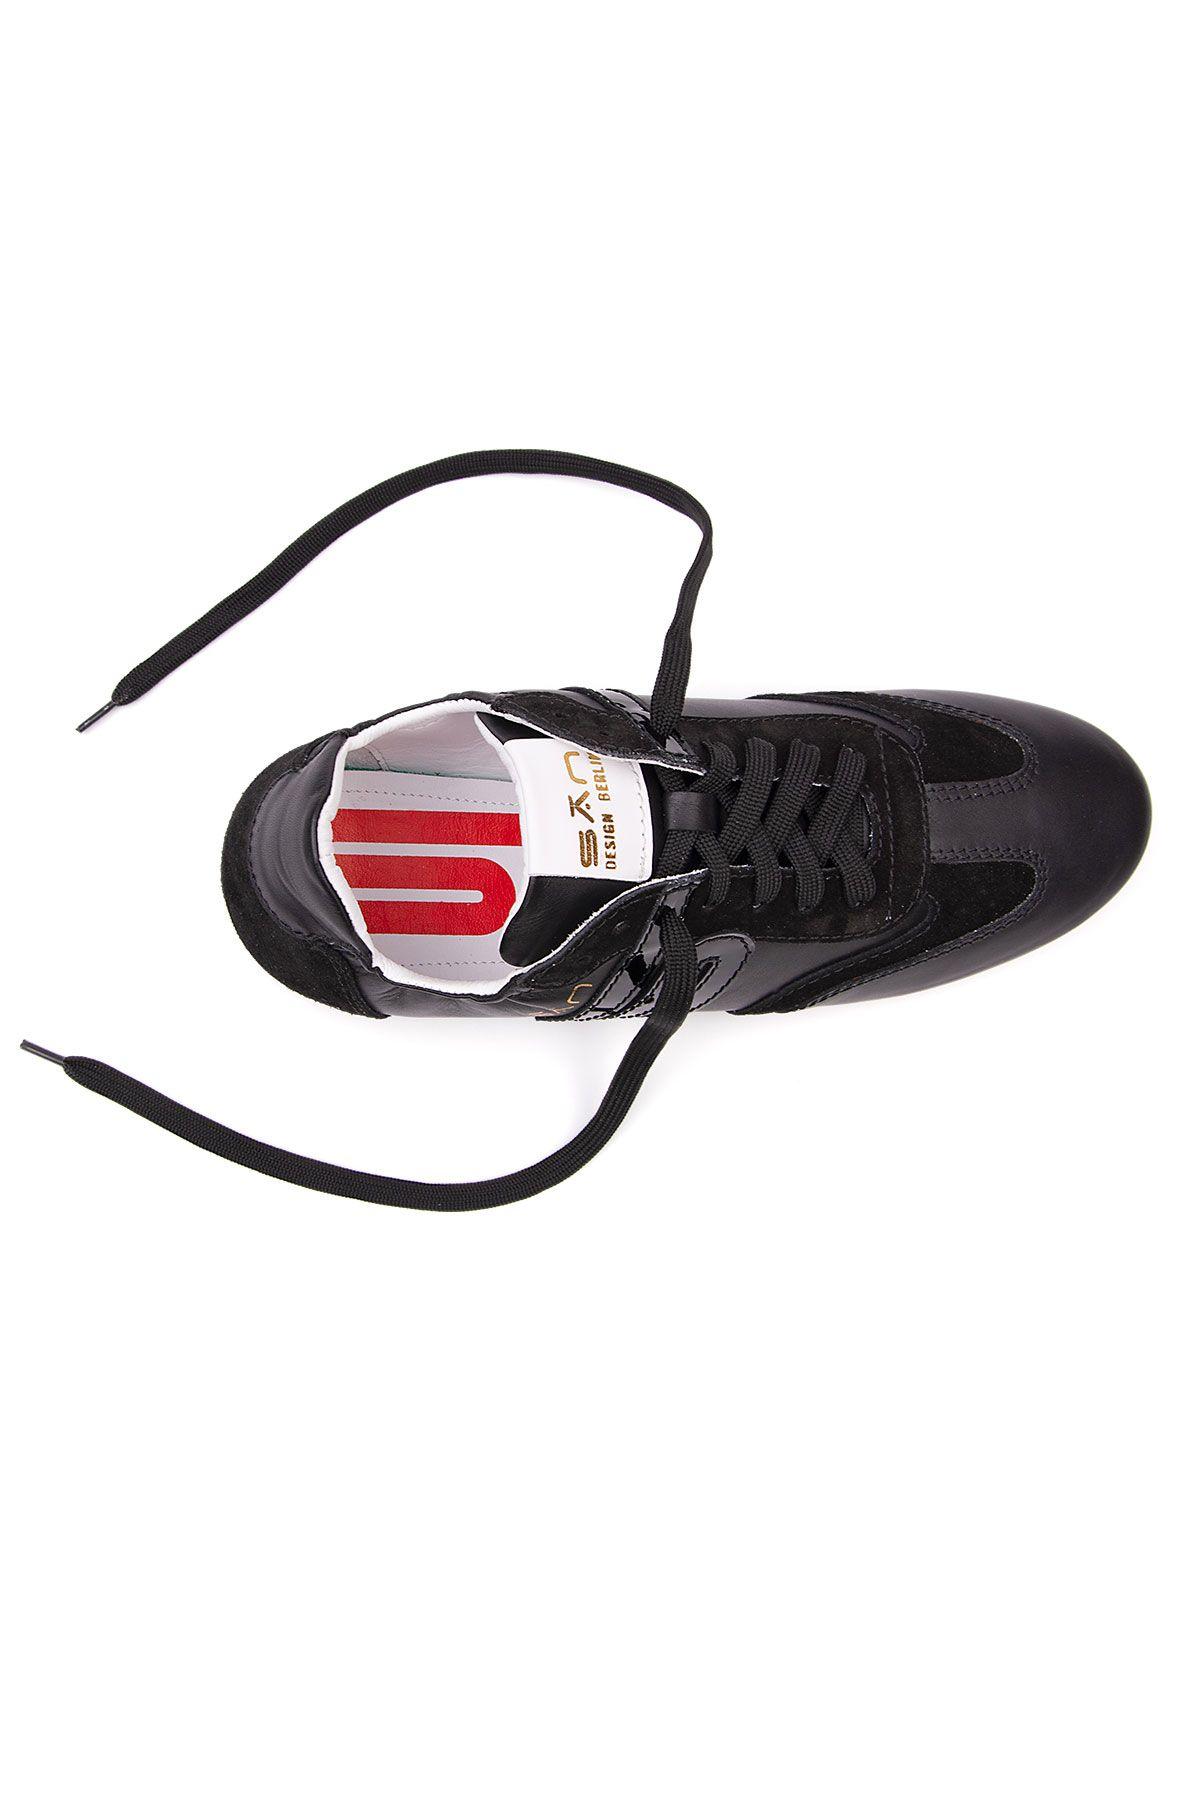 San Women's Leather Sneakers SAN04S Black